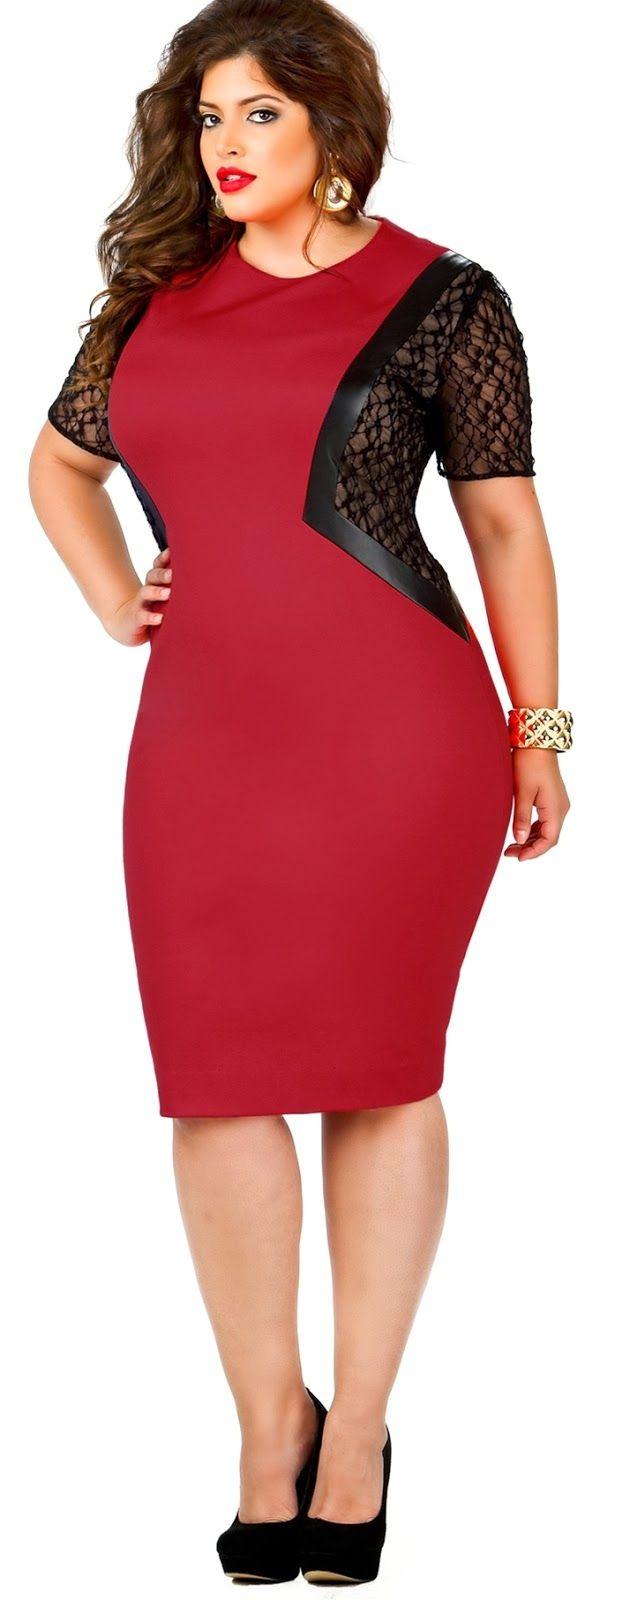 Fabulous plus size mini dress fashion for women---WHOA, HOT! I would ADORE this!